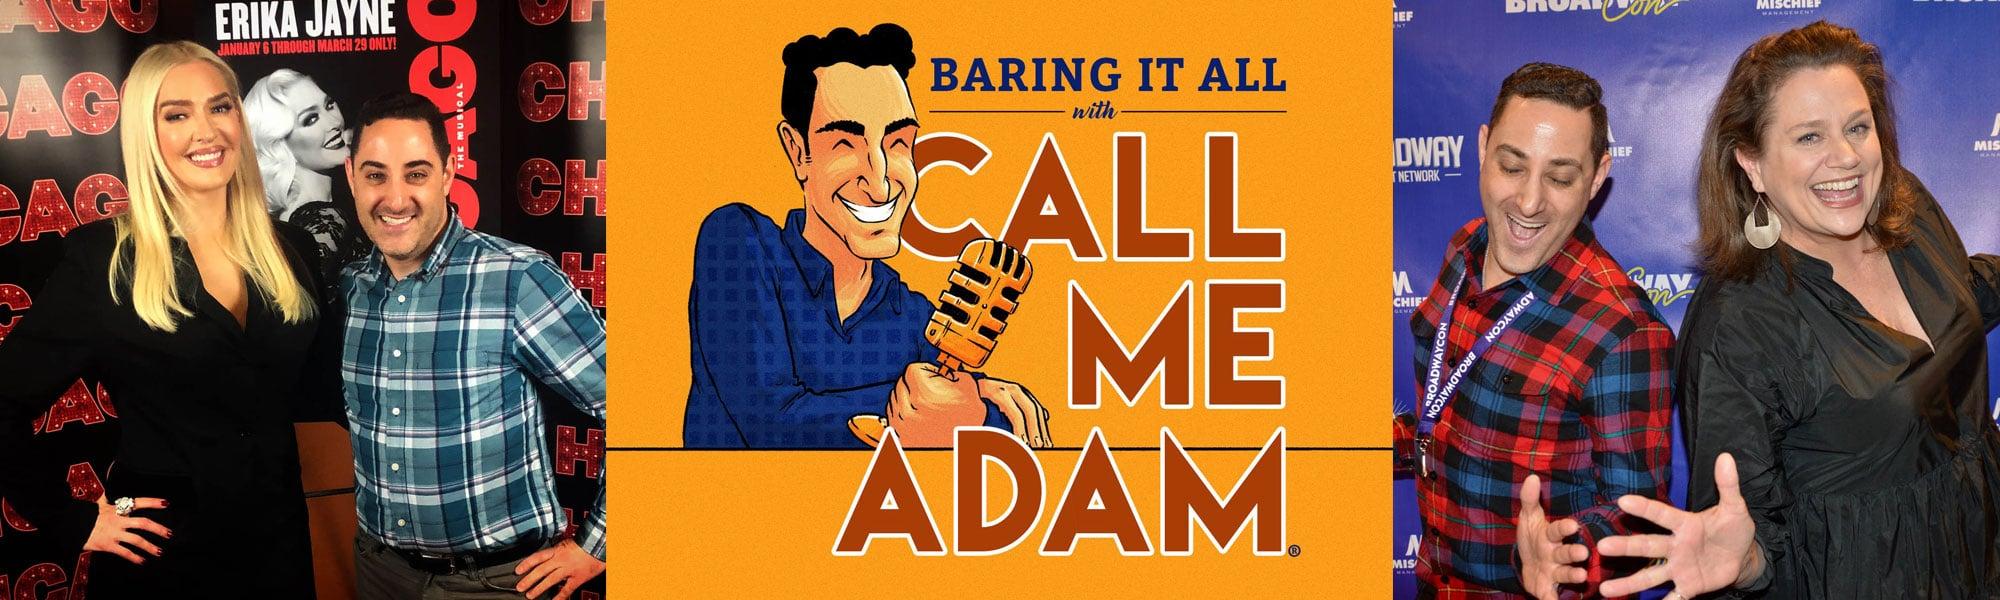 Baring It All with Call Me Adam, Erika Jayne, Cady Huffman